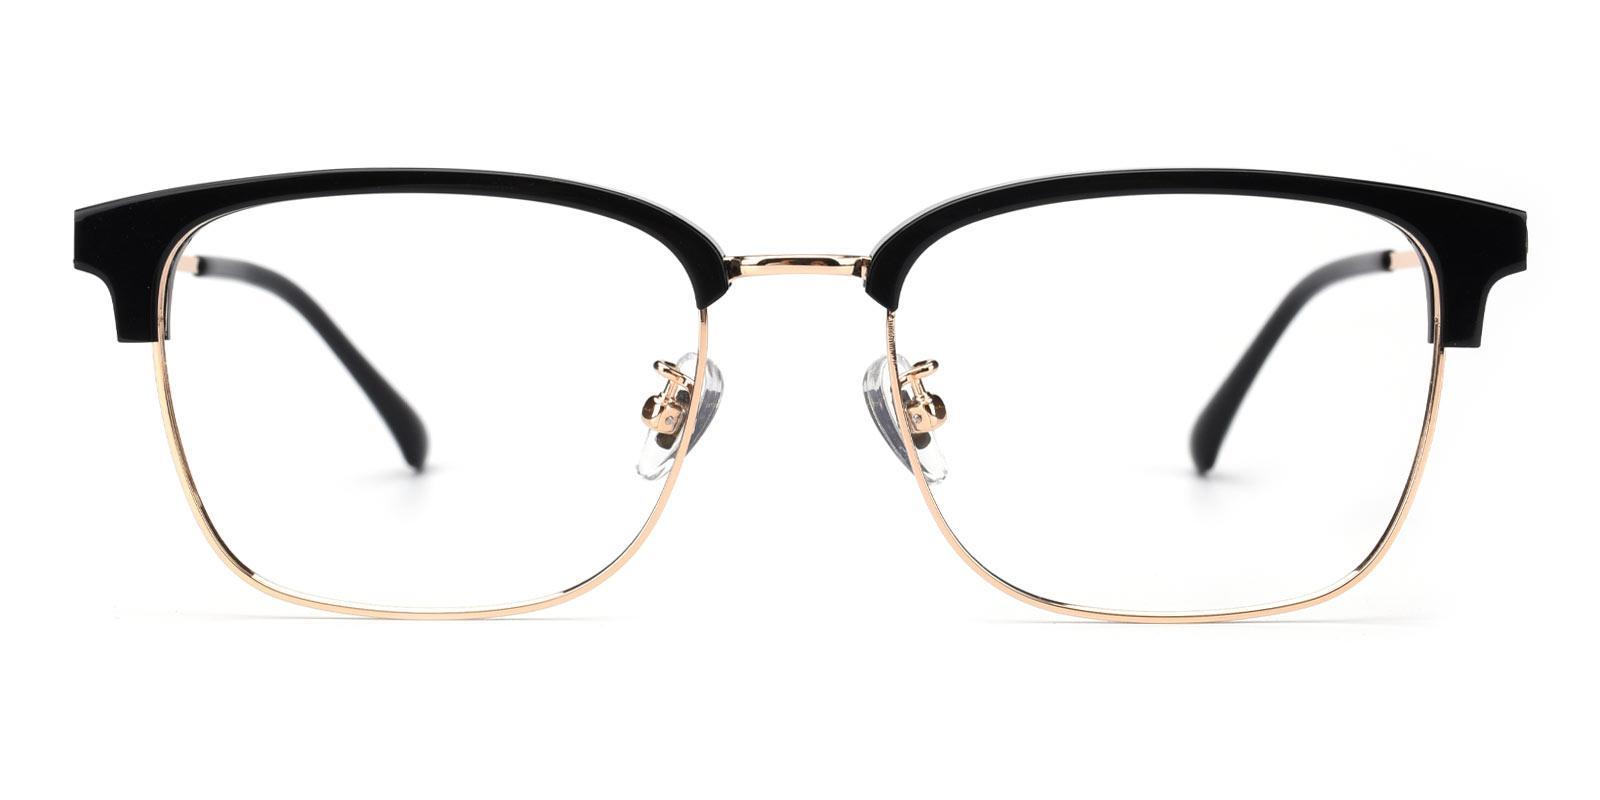 Yuri-Gold-Browline-Titanium-Eyeglasses-additional2